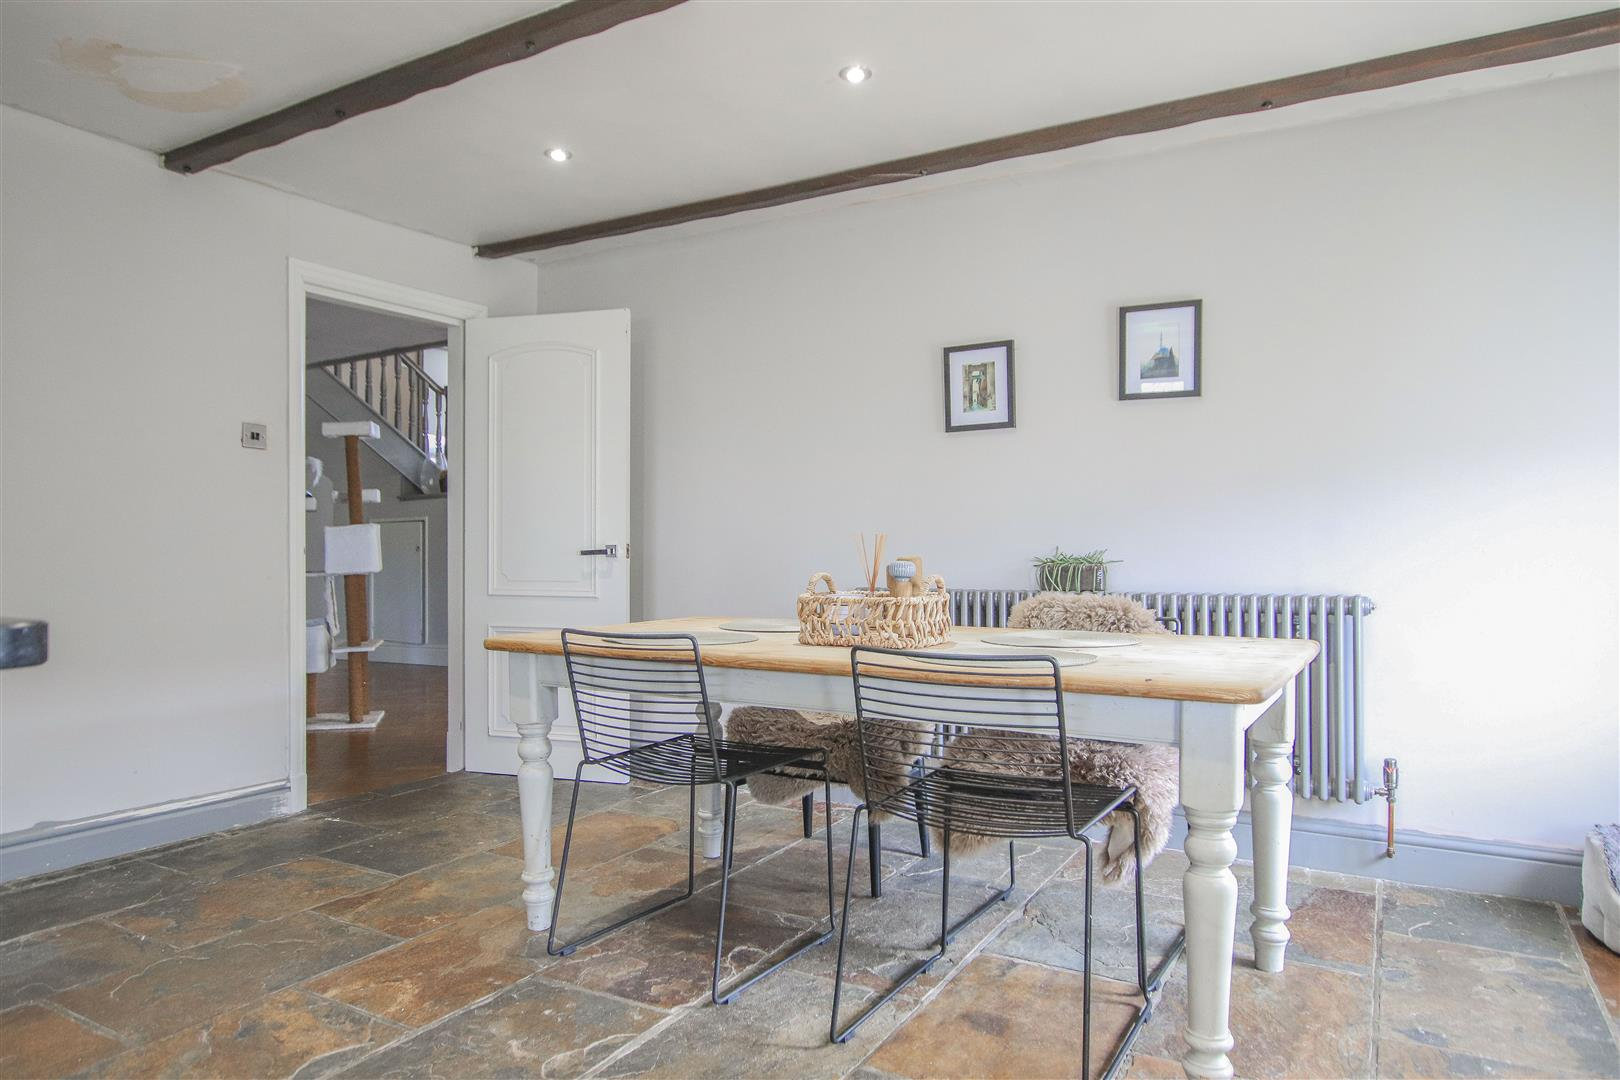 6 Bedroom Barn Conversion For Sale - 6.JPG